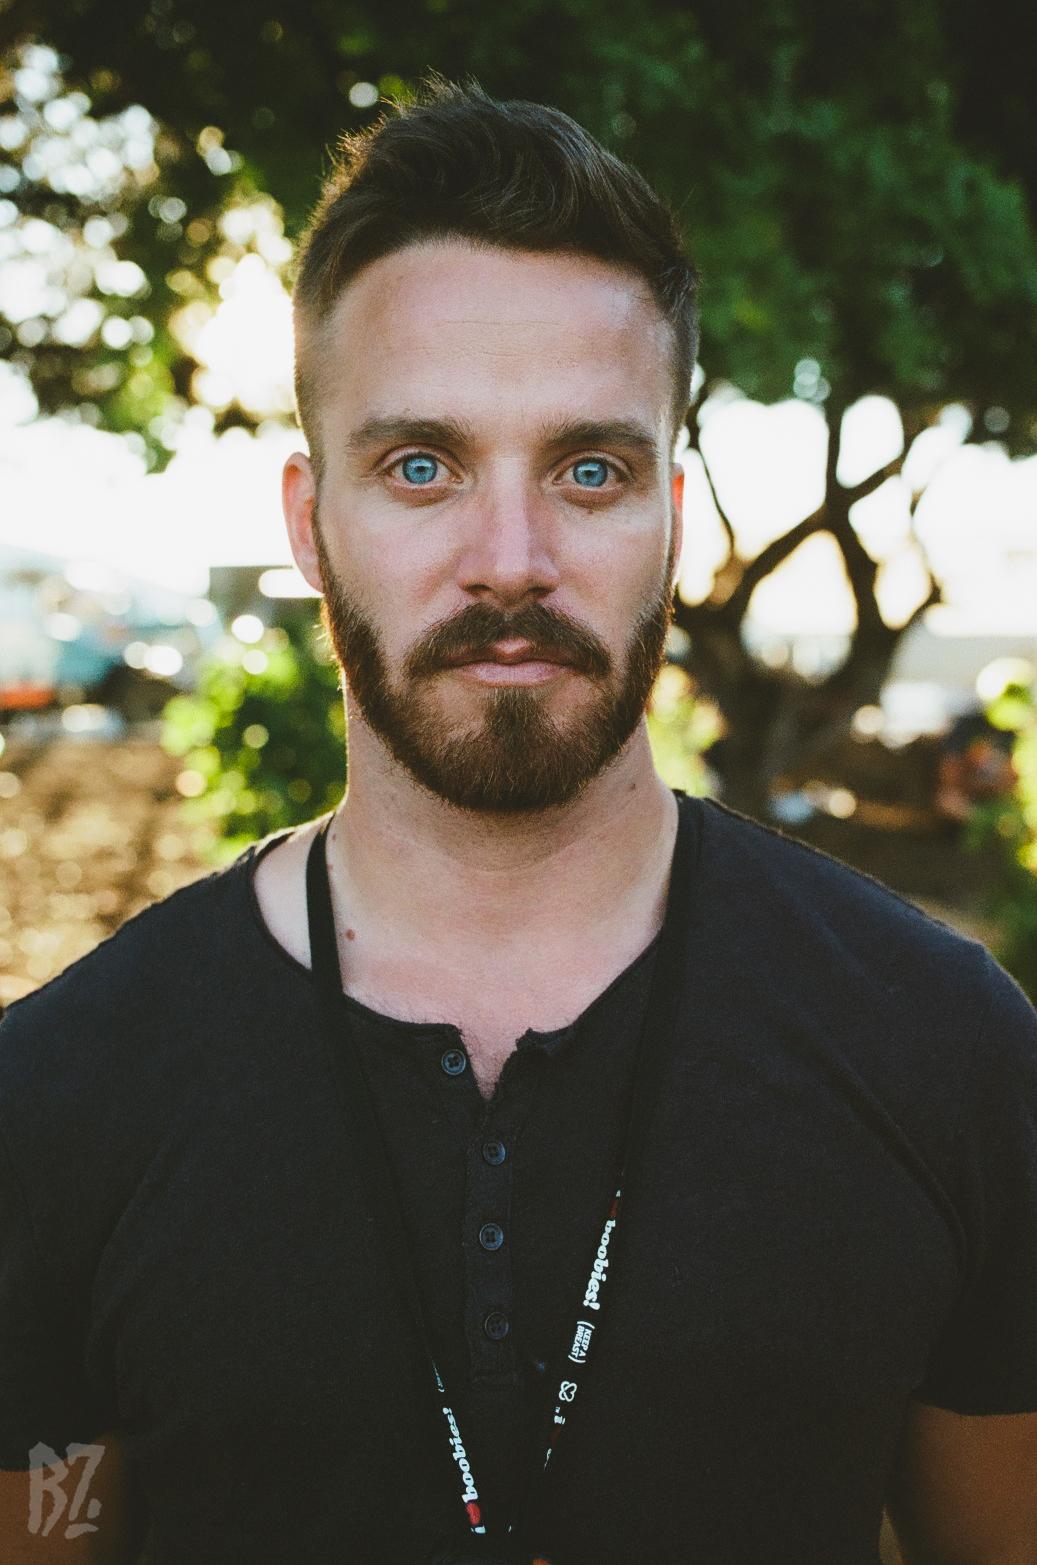 Ryan | Tour Manager for Metro Station